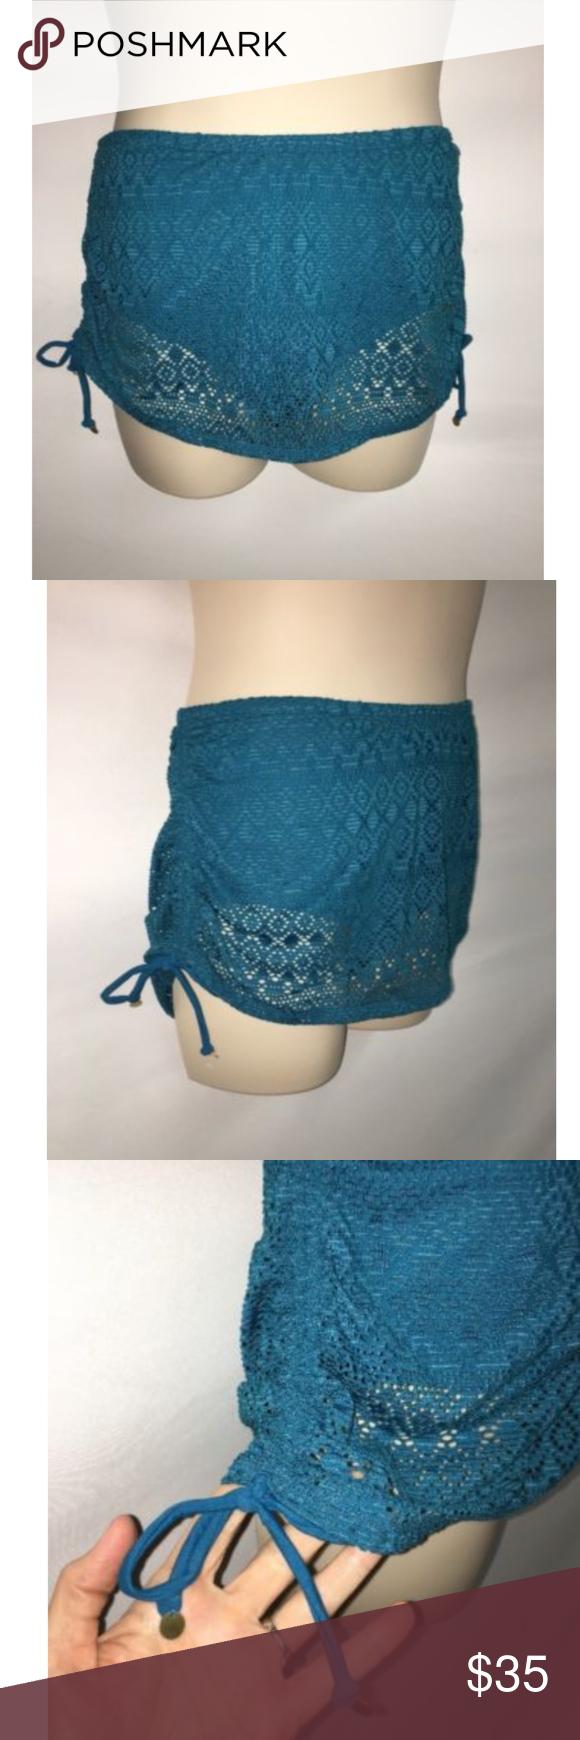 Swim By Cacique Swim Skirt Plus Size 14 Crochet Womens NWOT